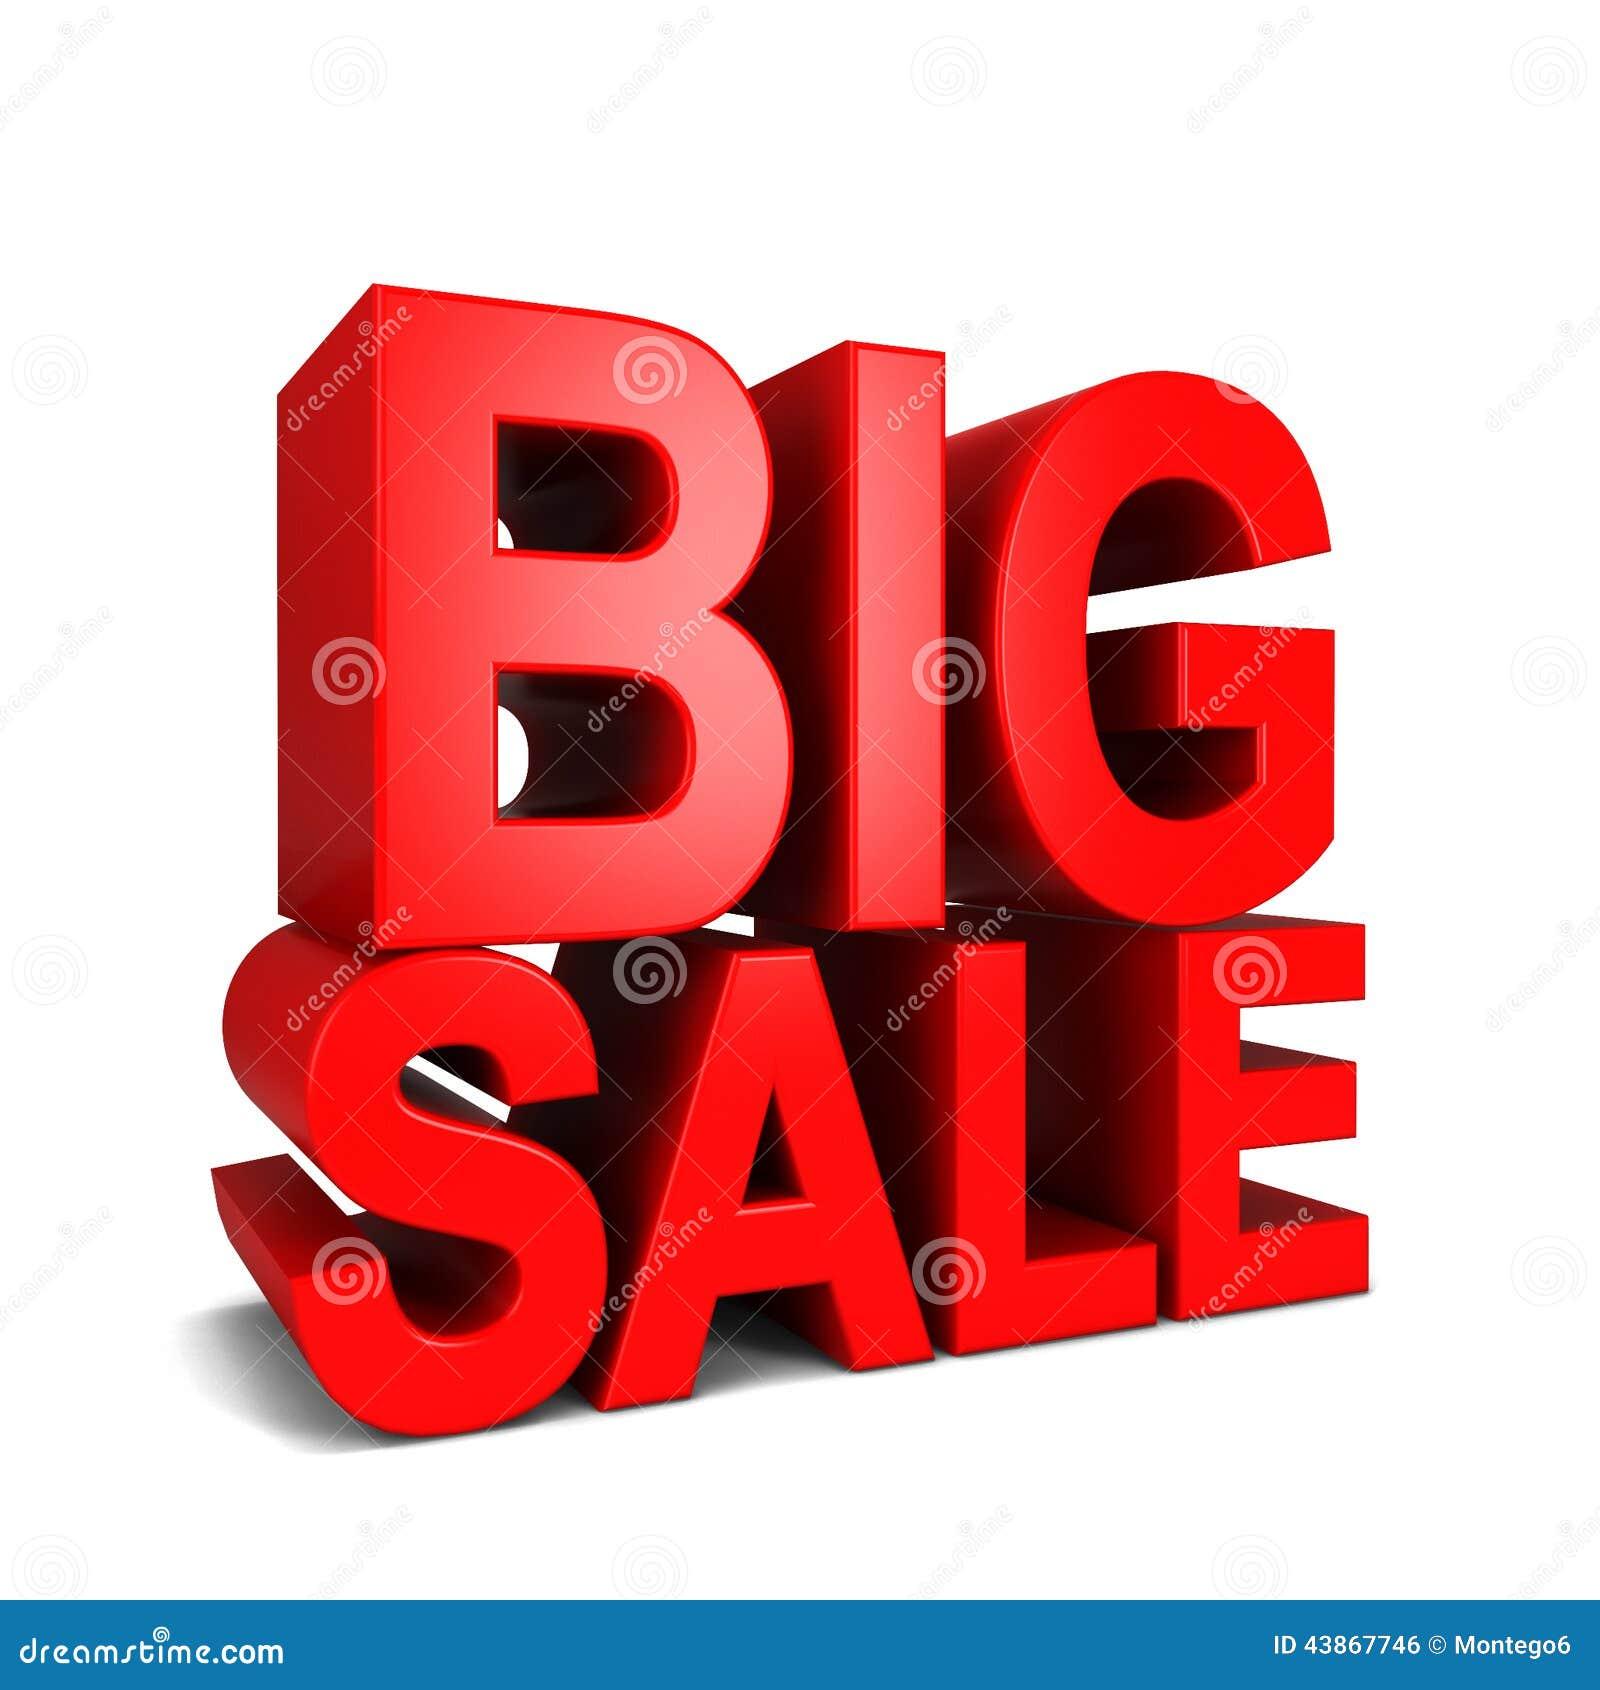 Big Sale Stock Illustration. Illustration Of Commerce